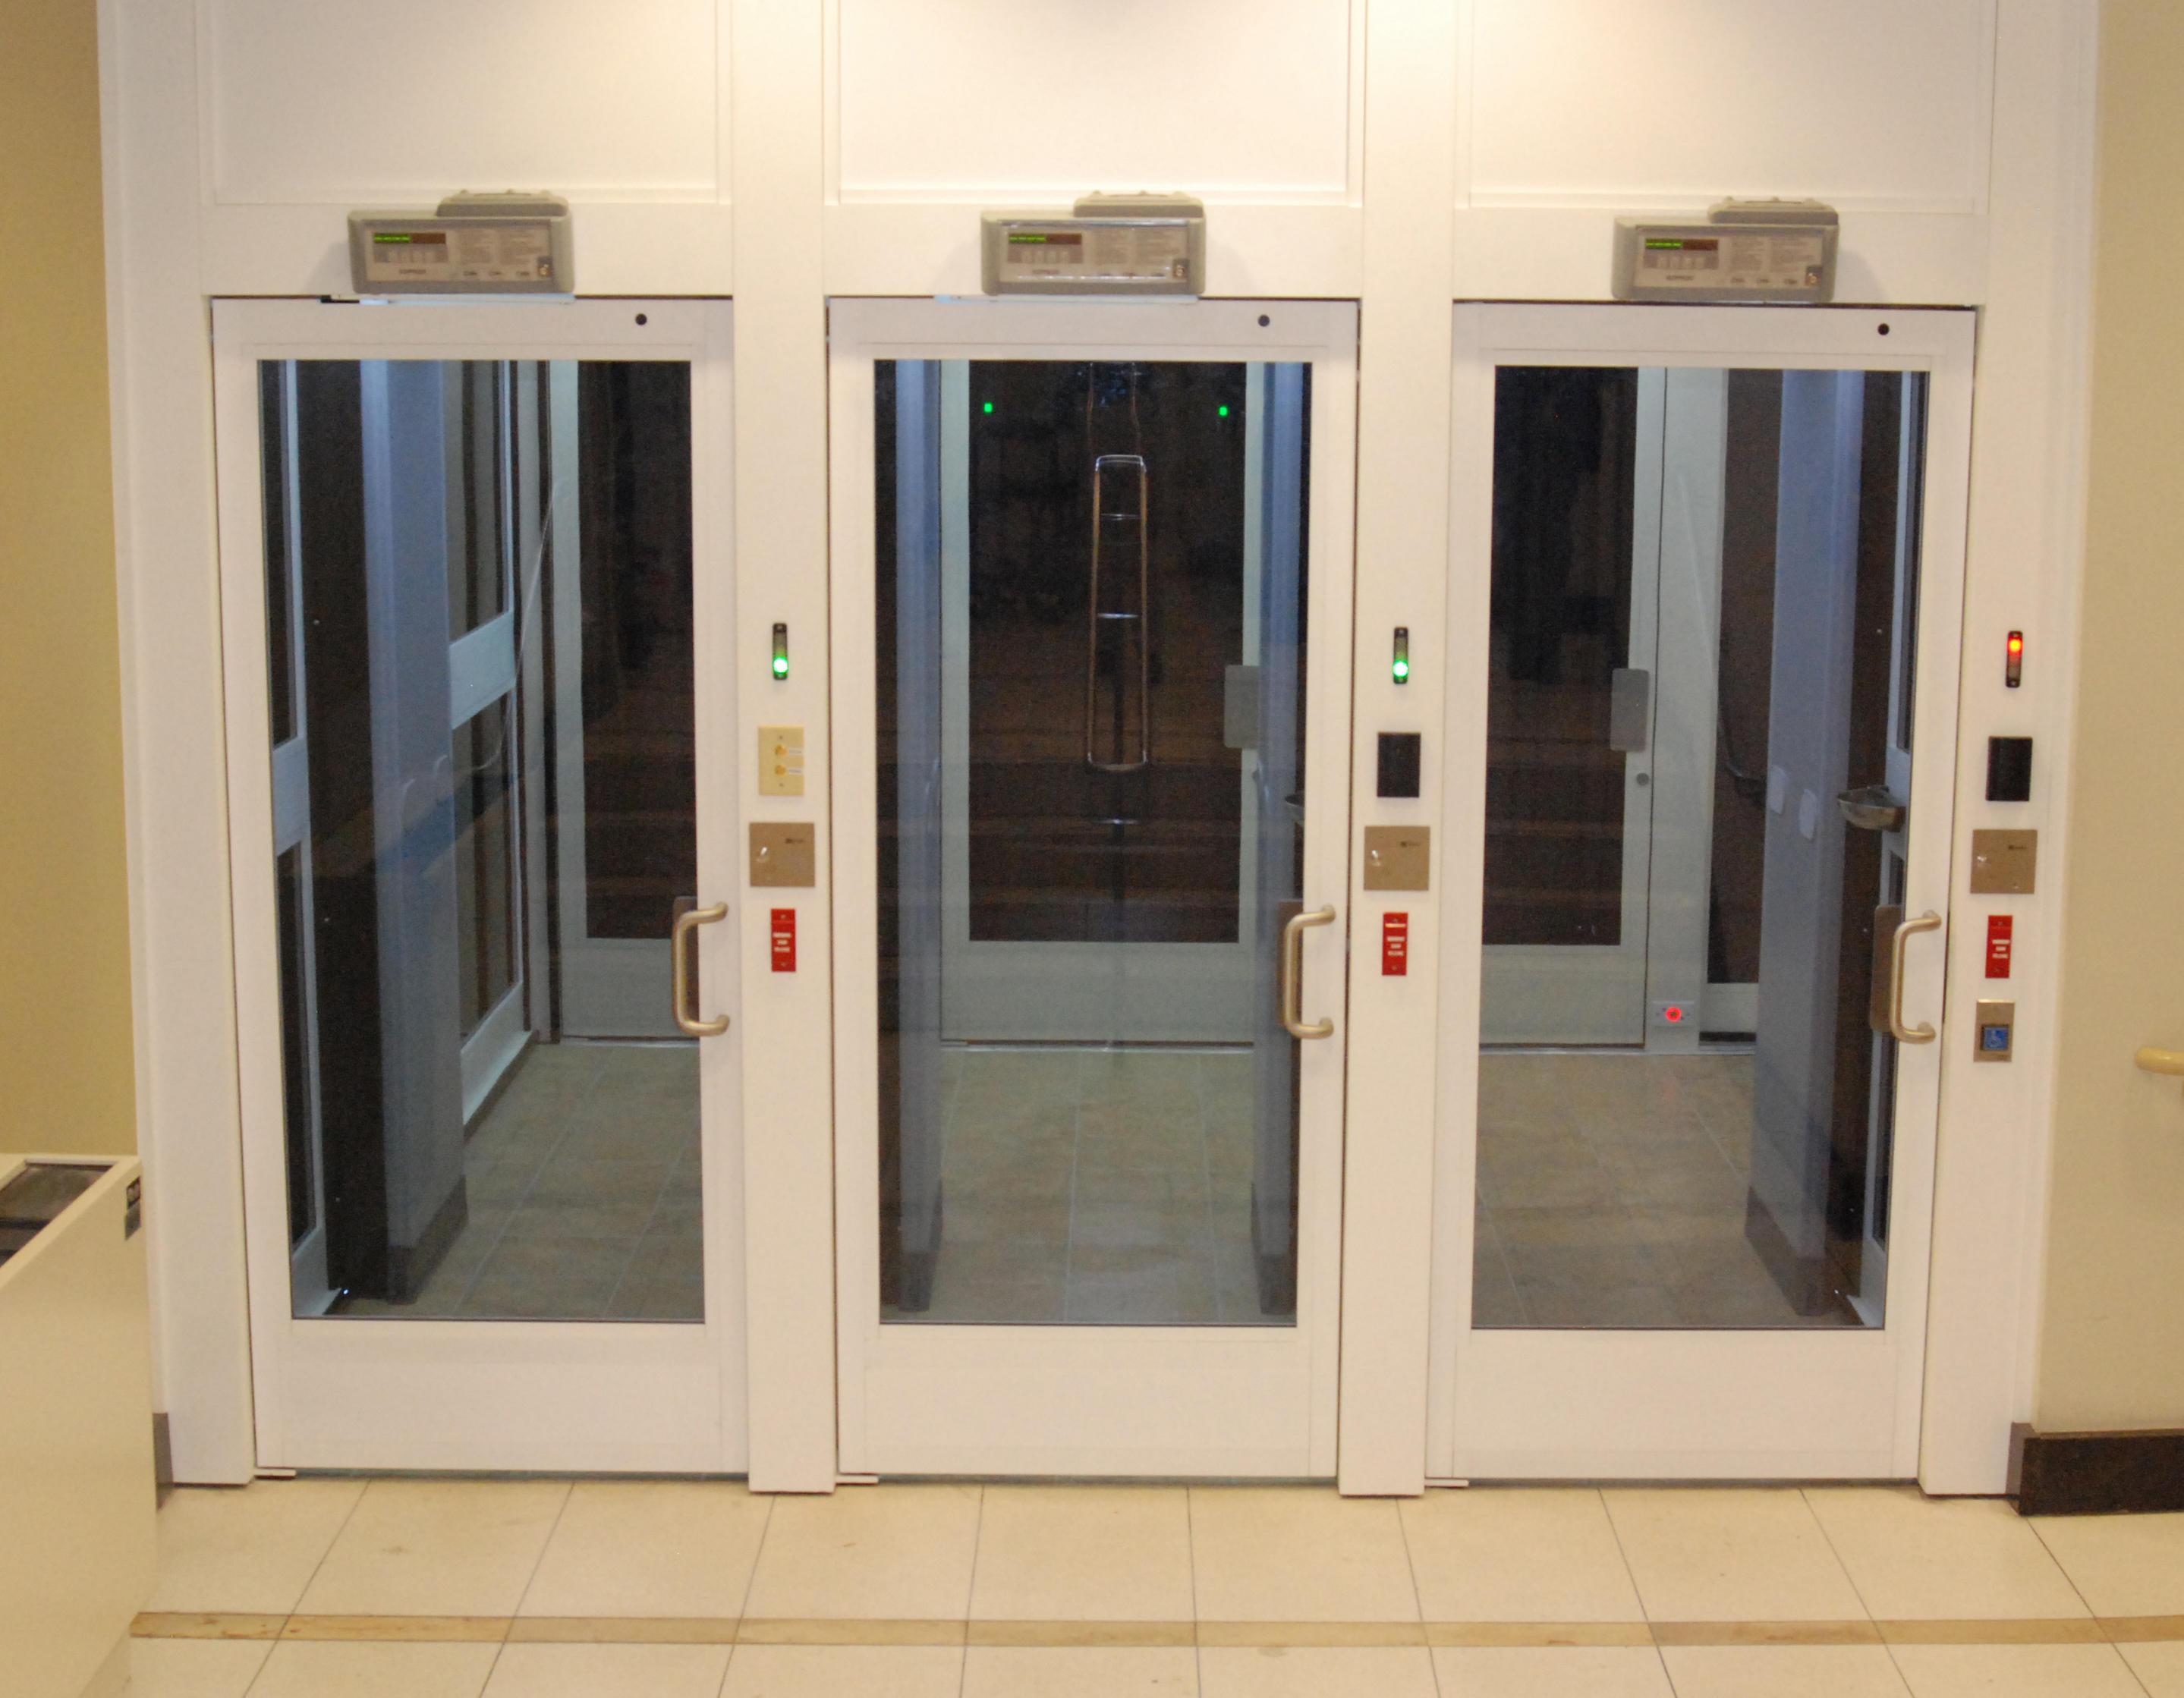 Walk Through Metal Detectors - Door Frame Metal Detectors